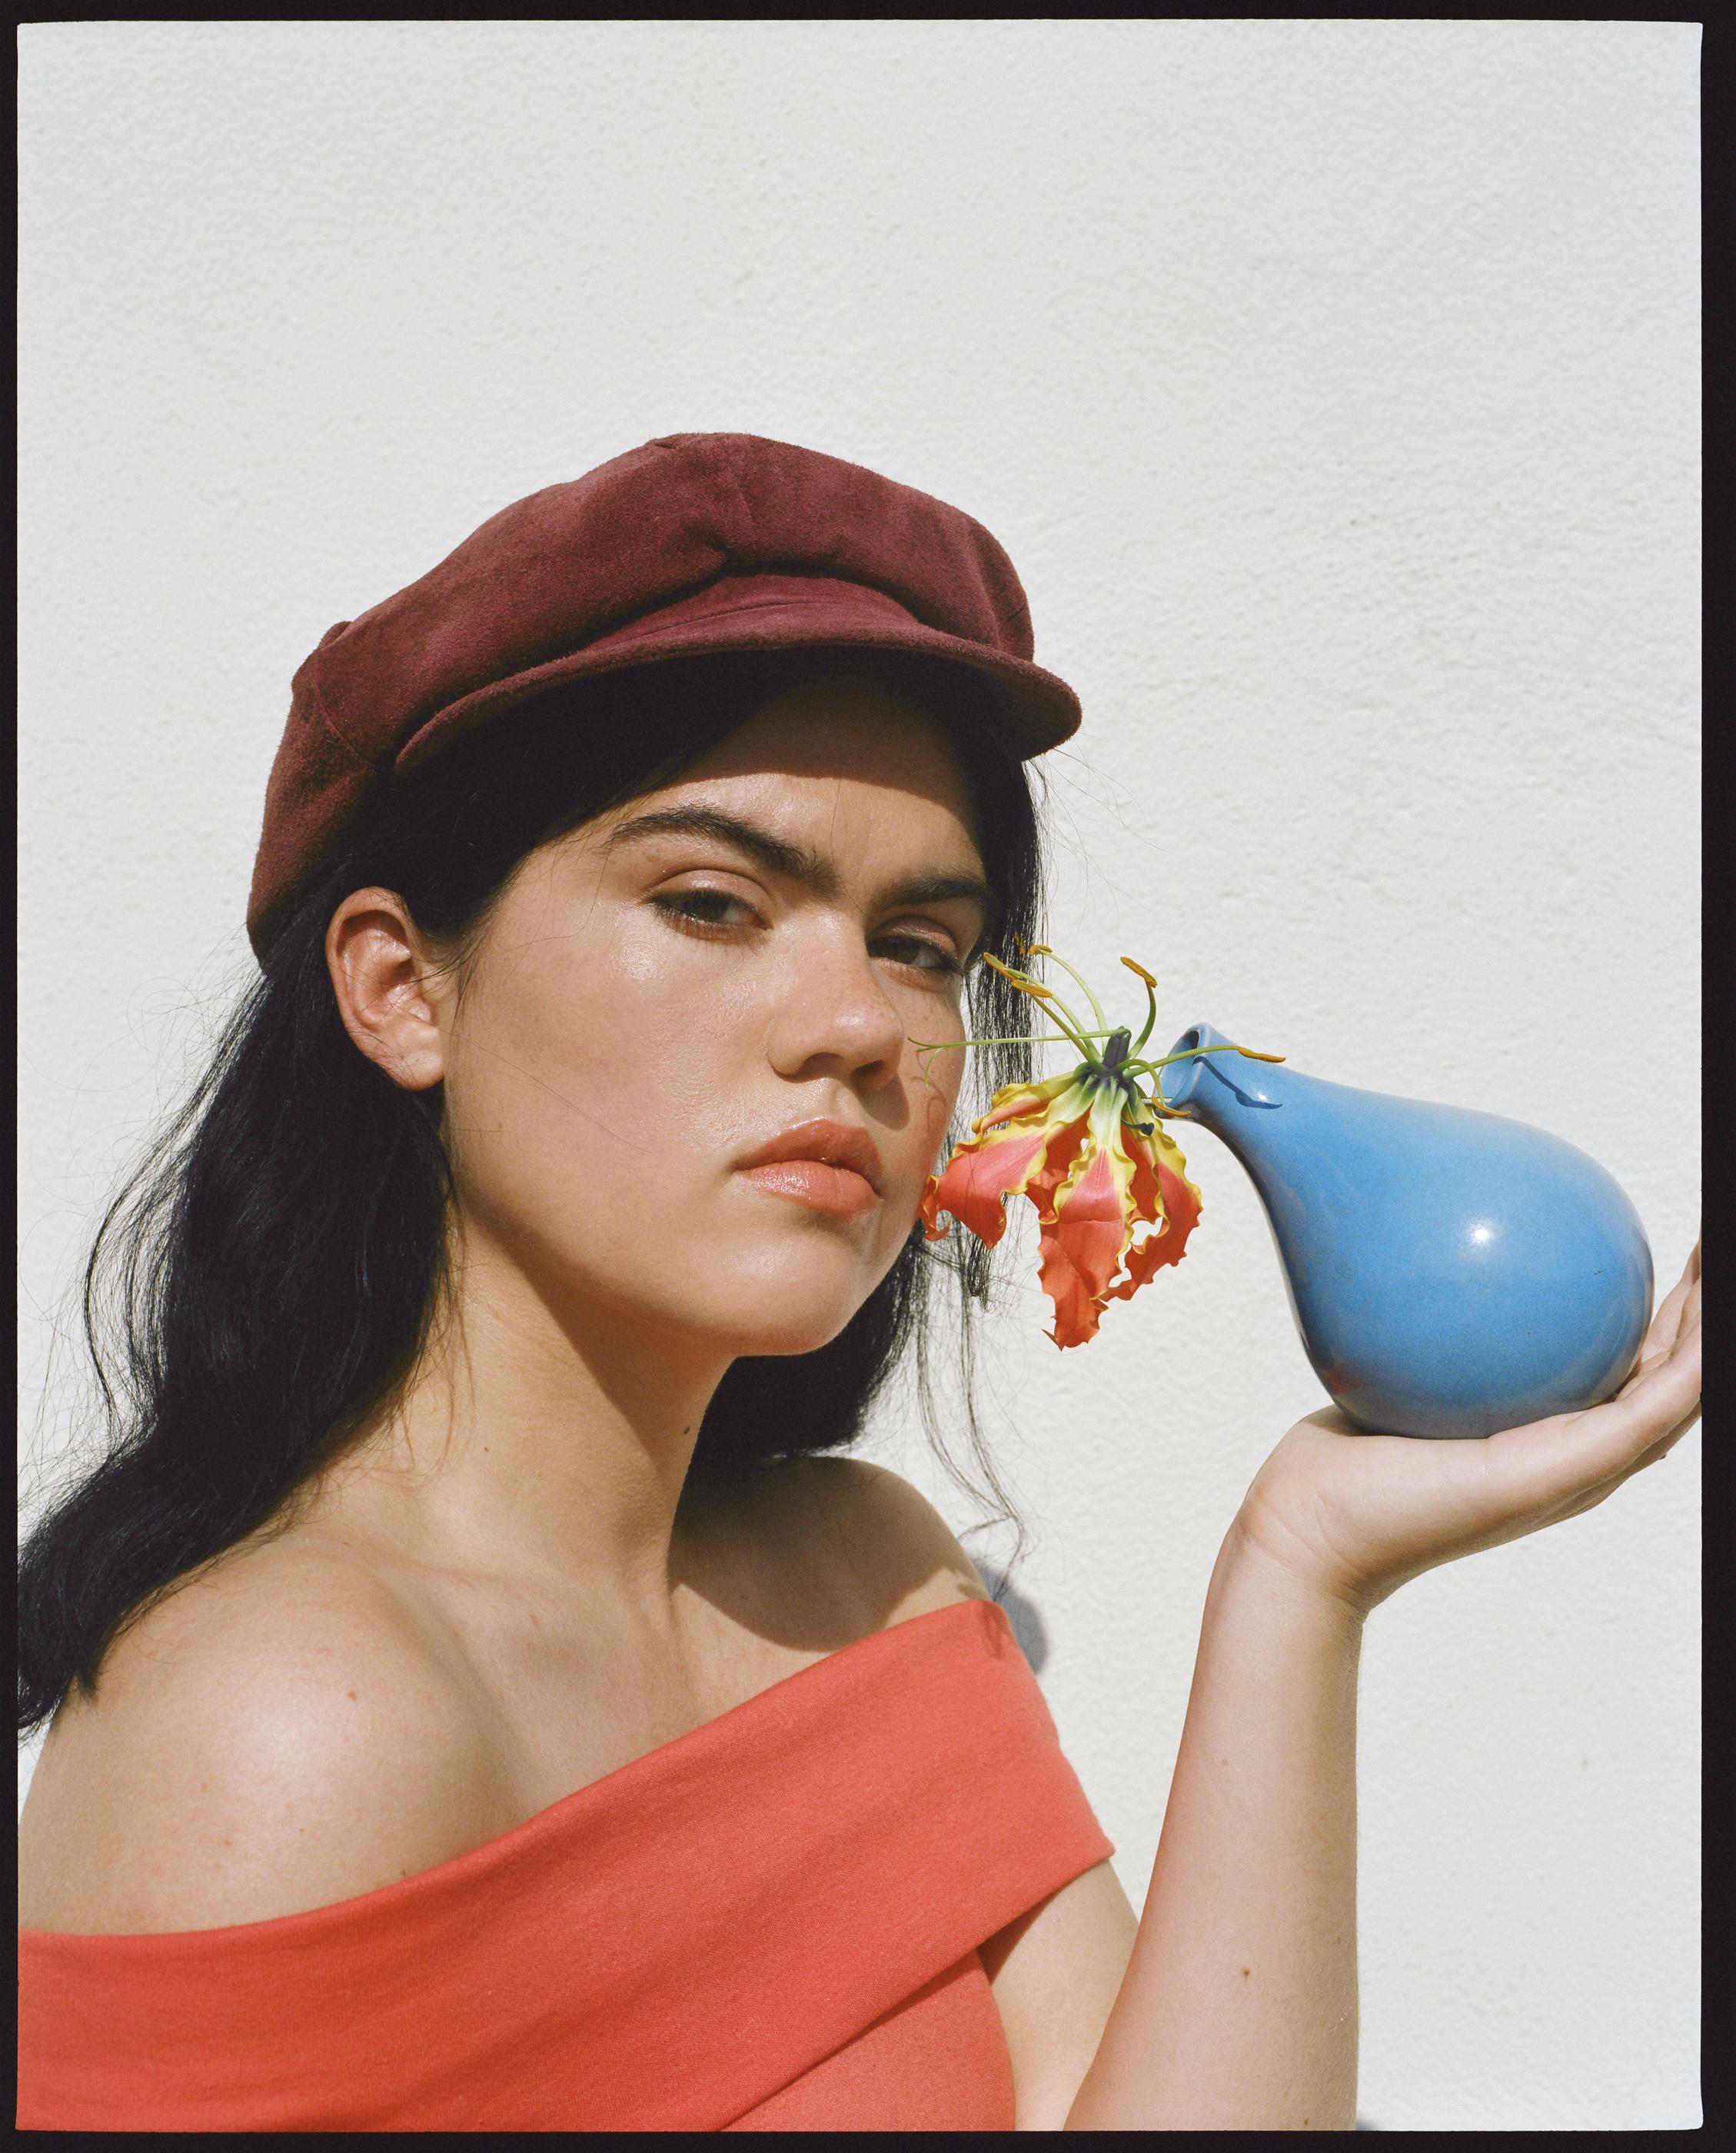 The Break Vintage MAKE Beauty Lissette Emma Rachael Krutchkoff Brooklyn